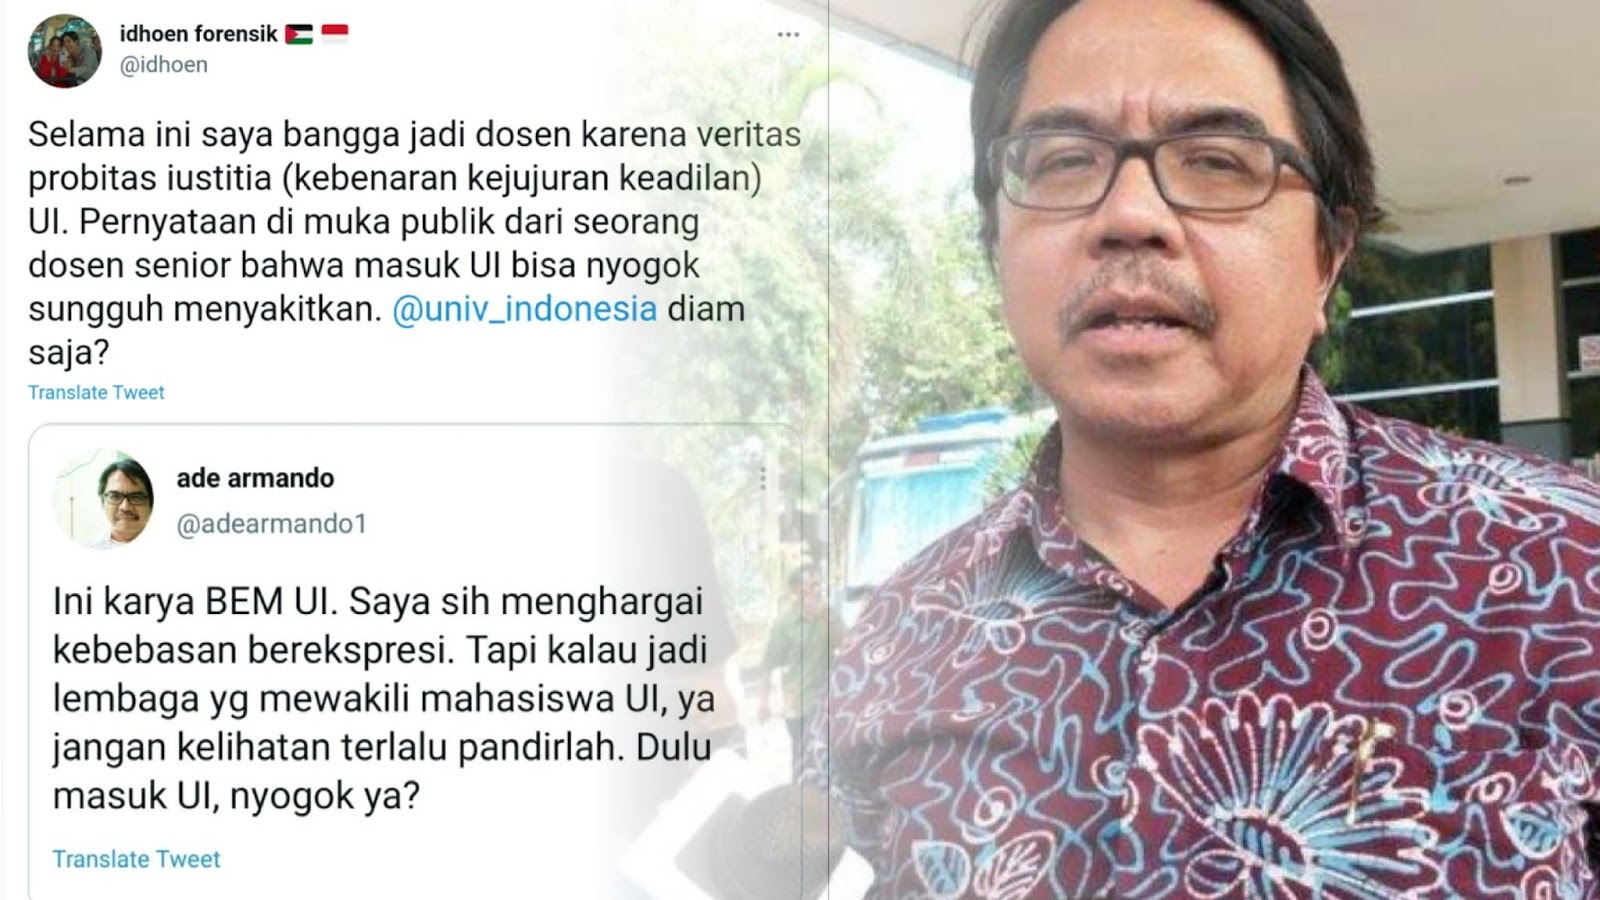 Ade Armando Diserang Alumni Gegara Sindir BEM UI Sebut 'Masuk UI Nyogok Ya?'